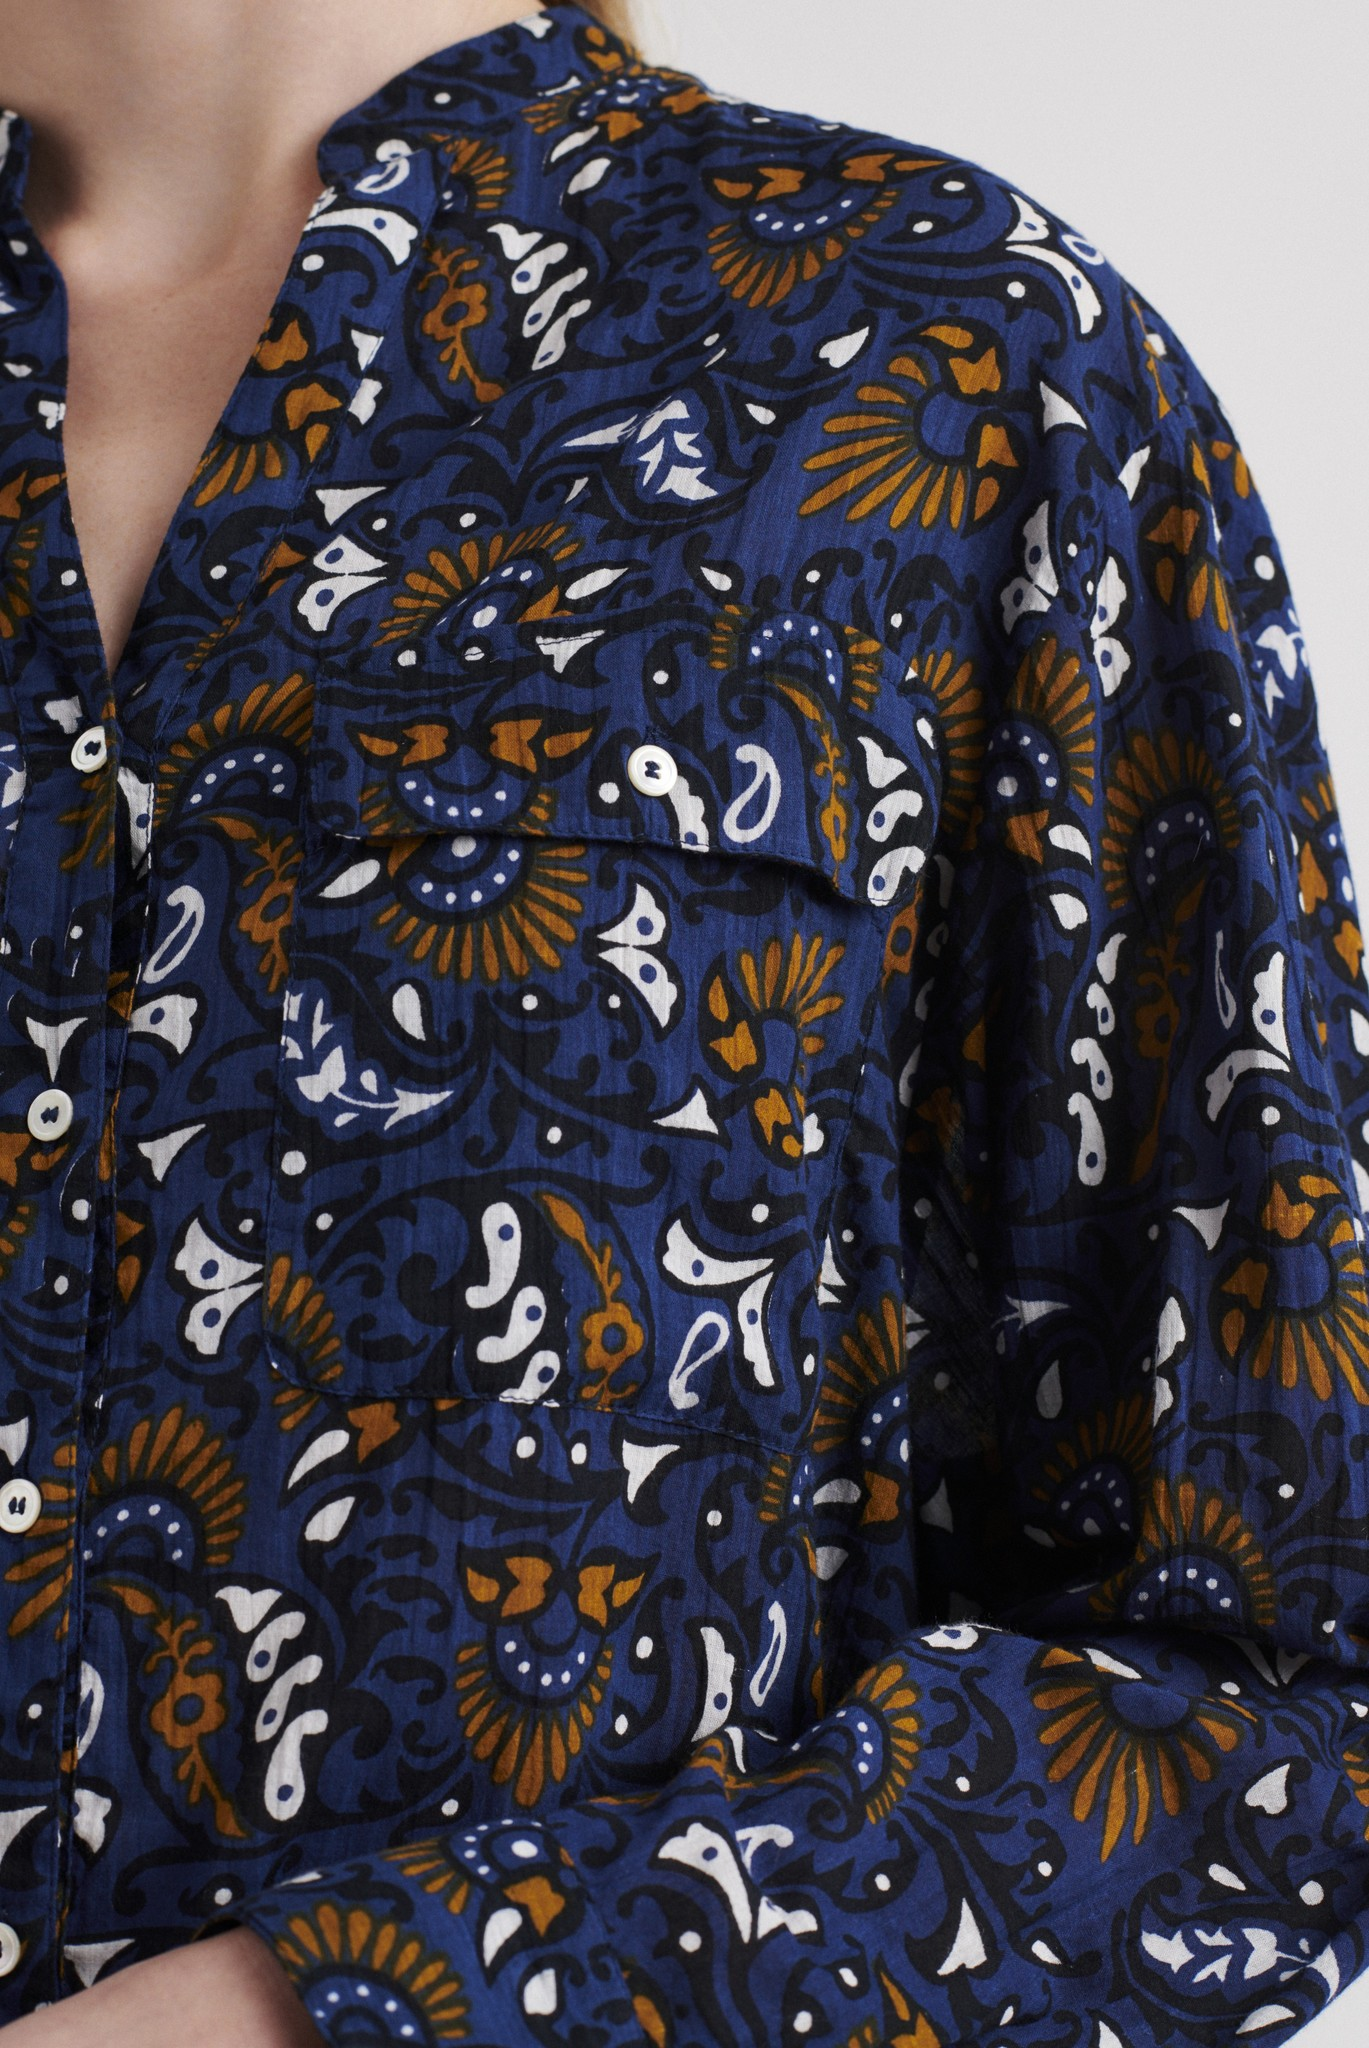 NATEO - Хлопковая блузка